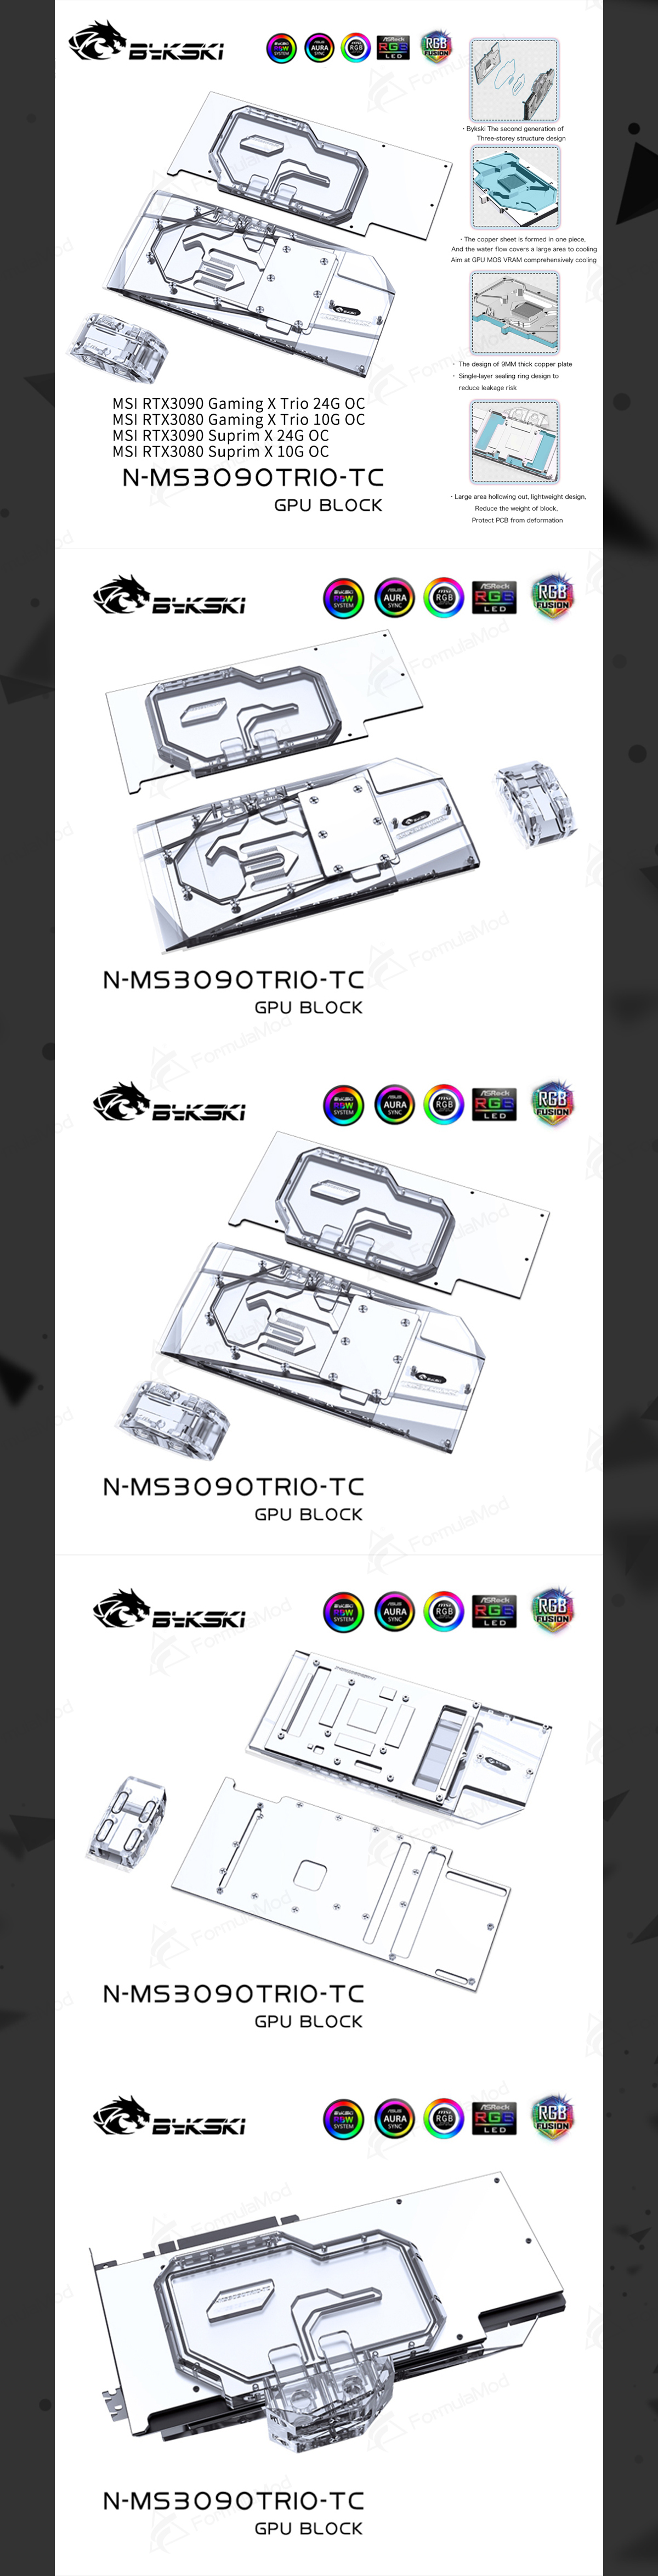 Bykski GPU Block With Active Waterway Backplane Cooler For MSI RTX 3090 3080 Gaming X Trio / Suprim X , N-MS3090TRIO-TC